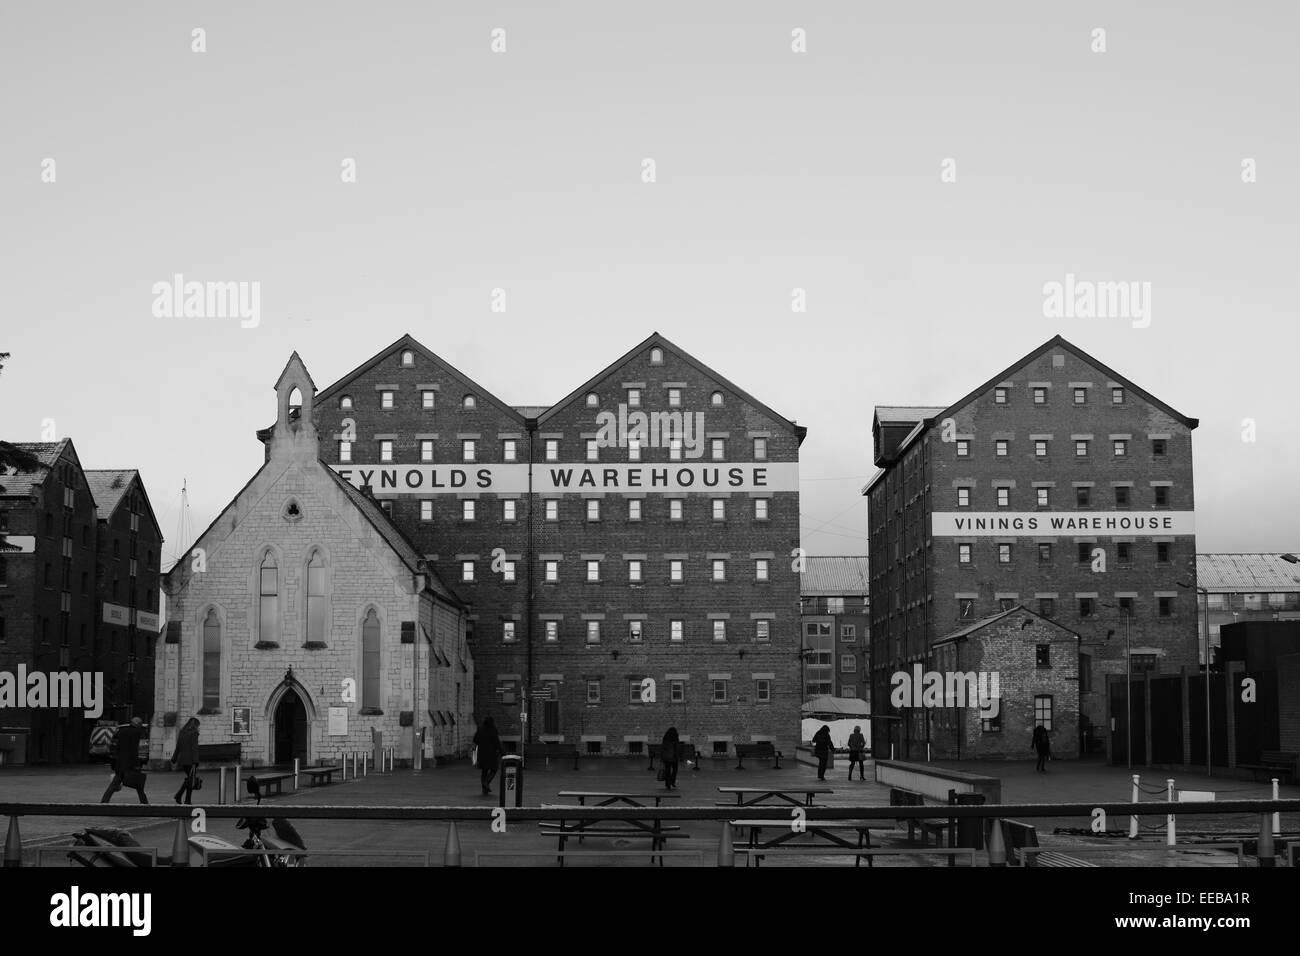 Monochrome Mariners Church & dock warehouses. - Stock Image